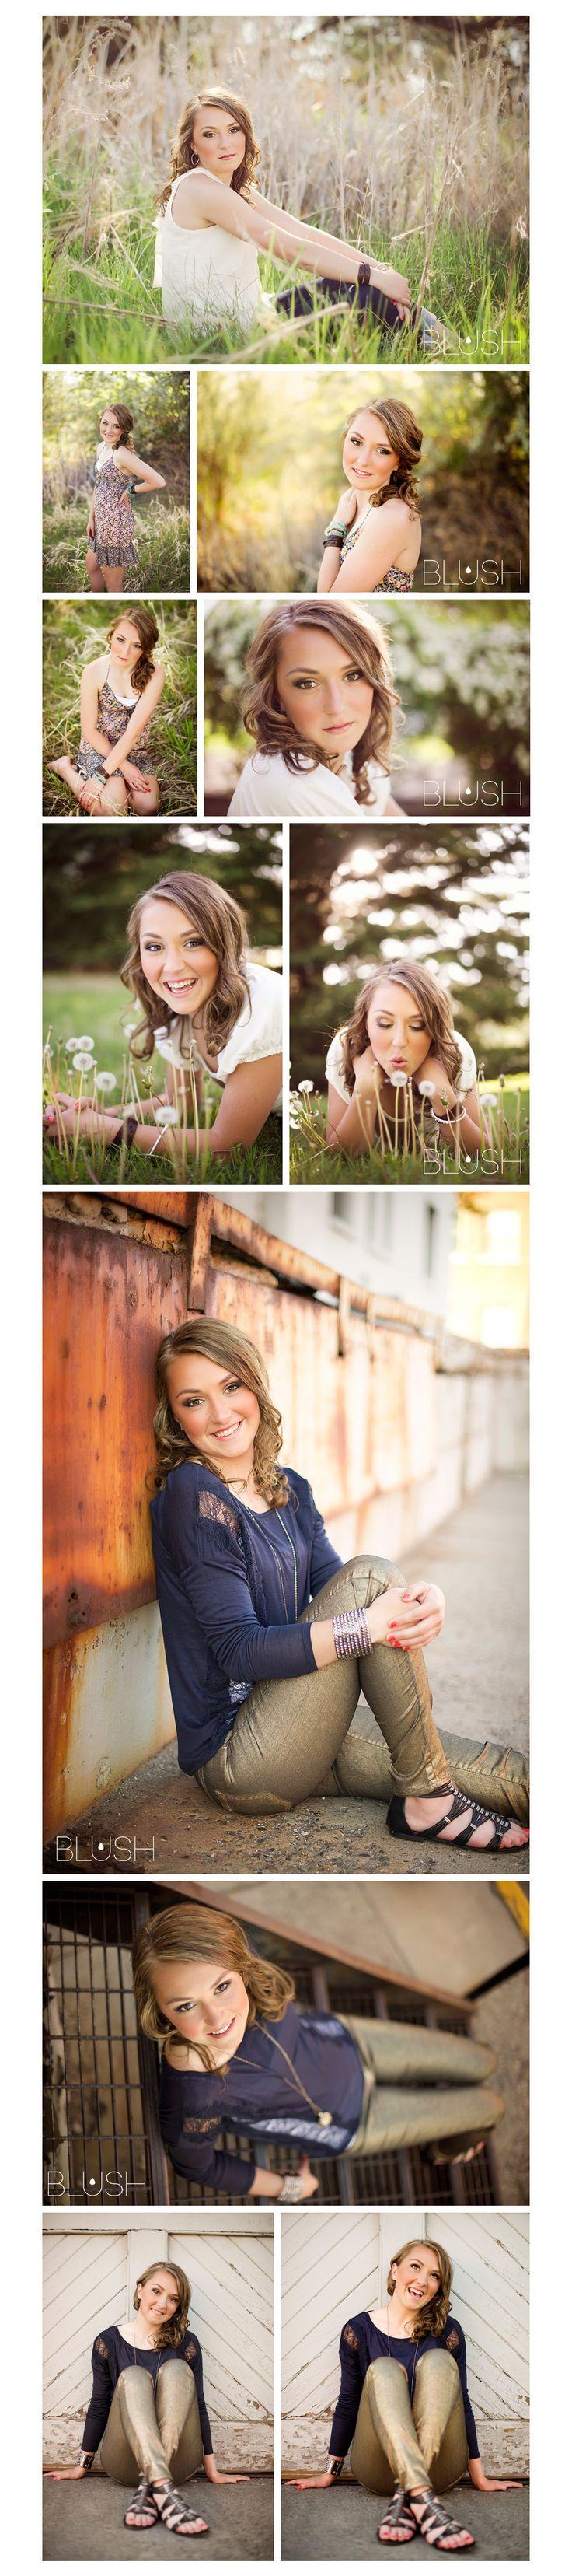 : Pictures Ideas, Senior Pictures, Senior Ideas, Senior Photography, Pics Ideas, Senior Pics, Senior Portraits, Senior Girls, Photography Pos